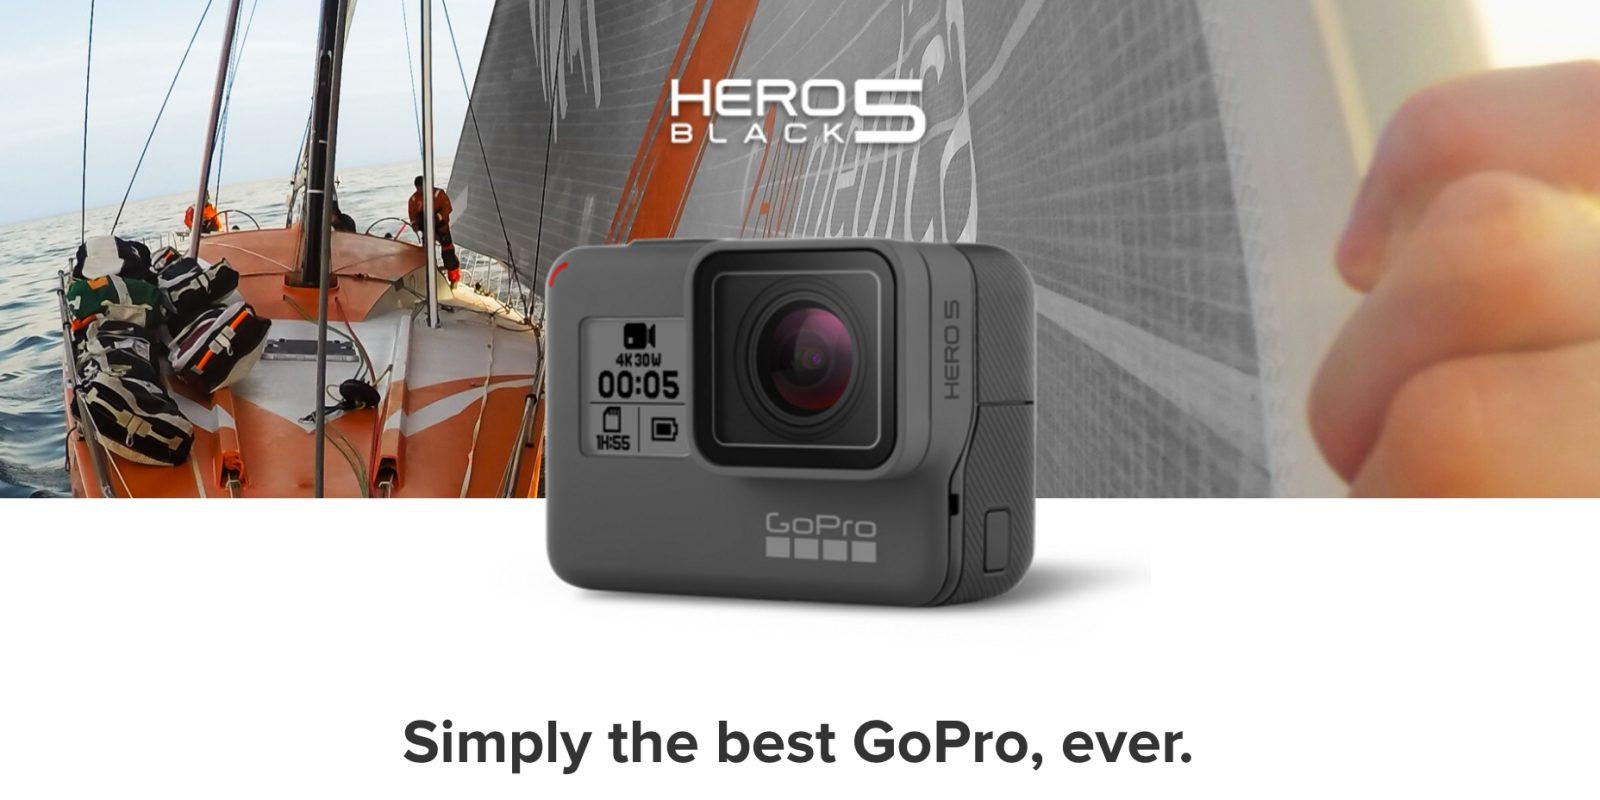 Gopro Hero5 4k Action Camera For 335 Shipped Reg 399 9to5toys Hero 5 Black Edition Go Pro